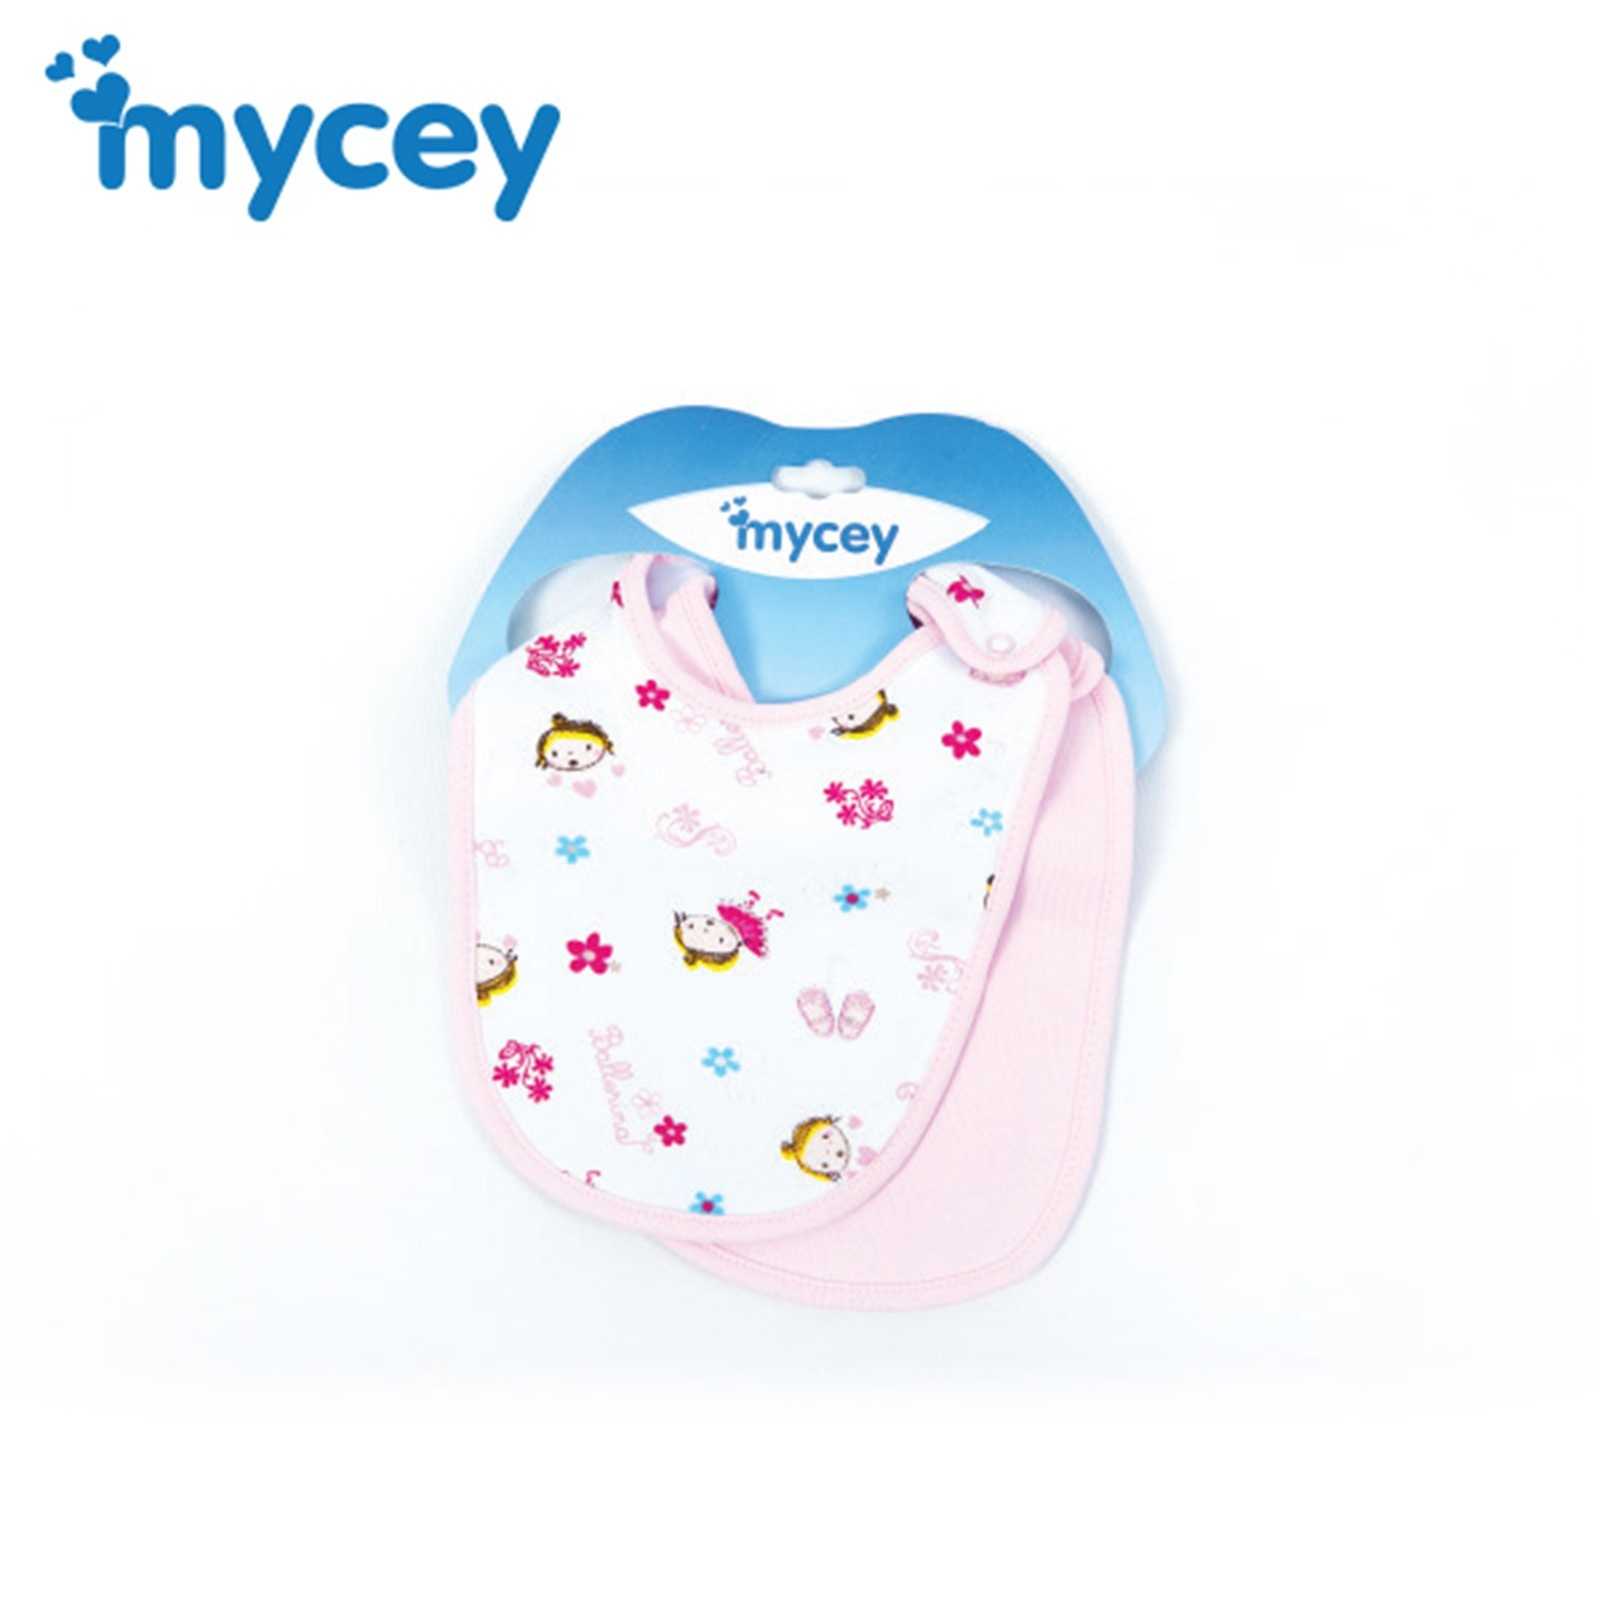 Ebebek Mycey Baby Cute Patterned Bib 2 Pcs